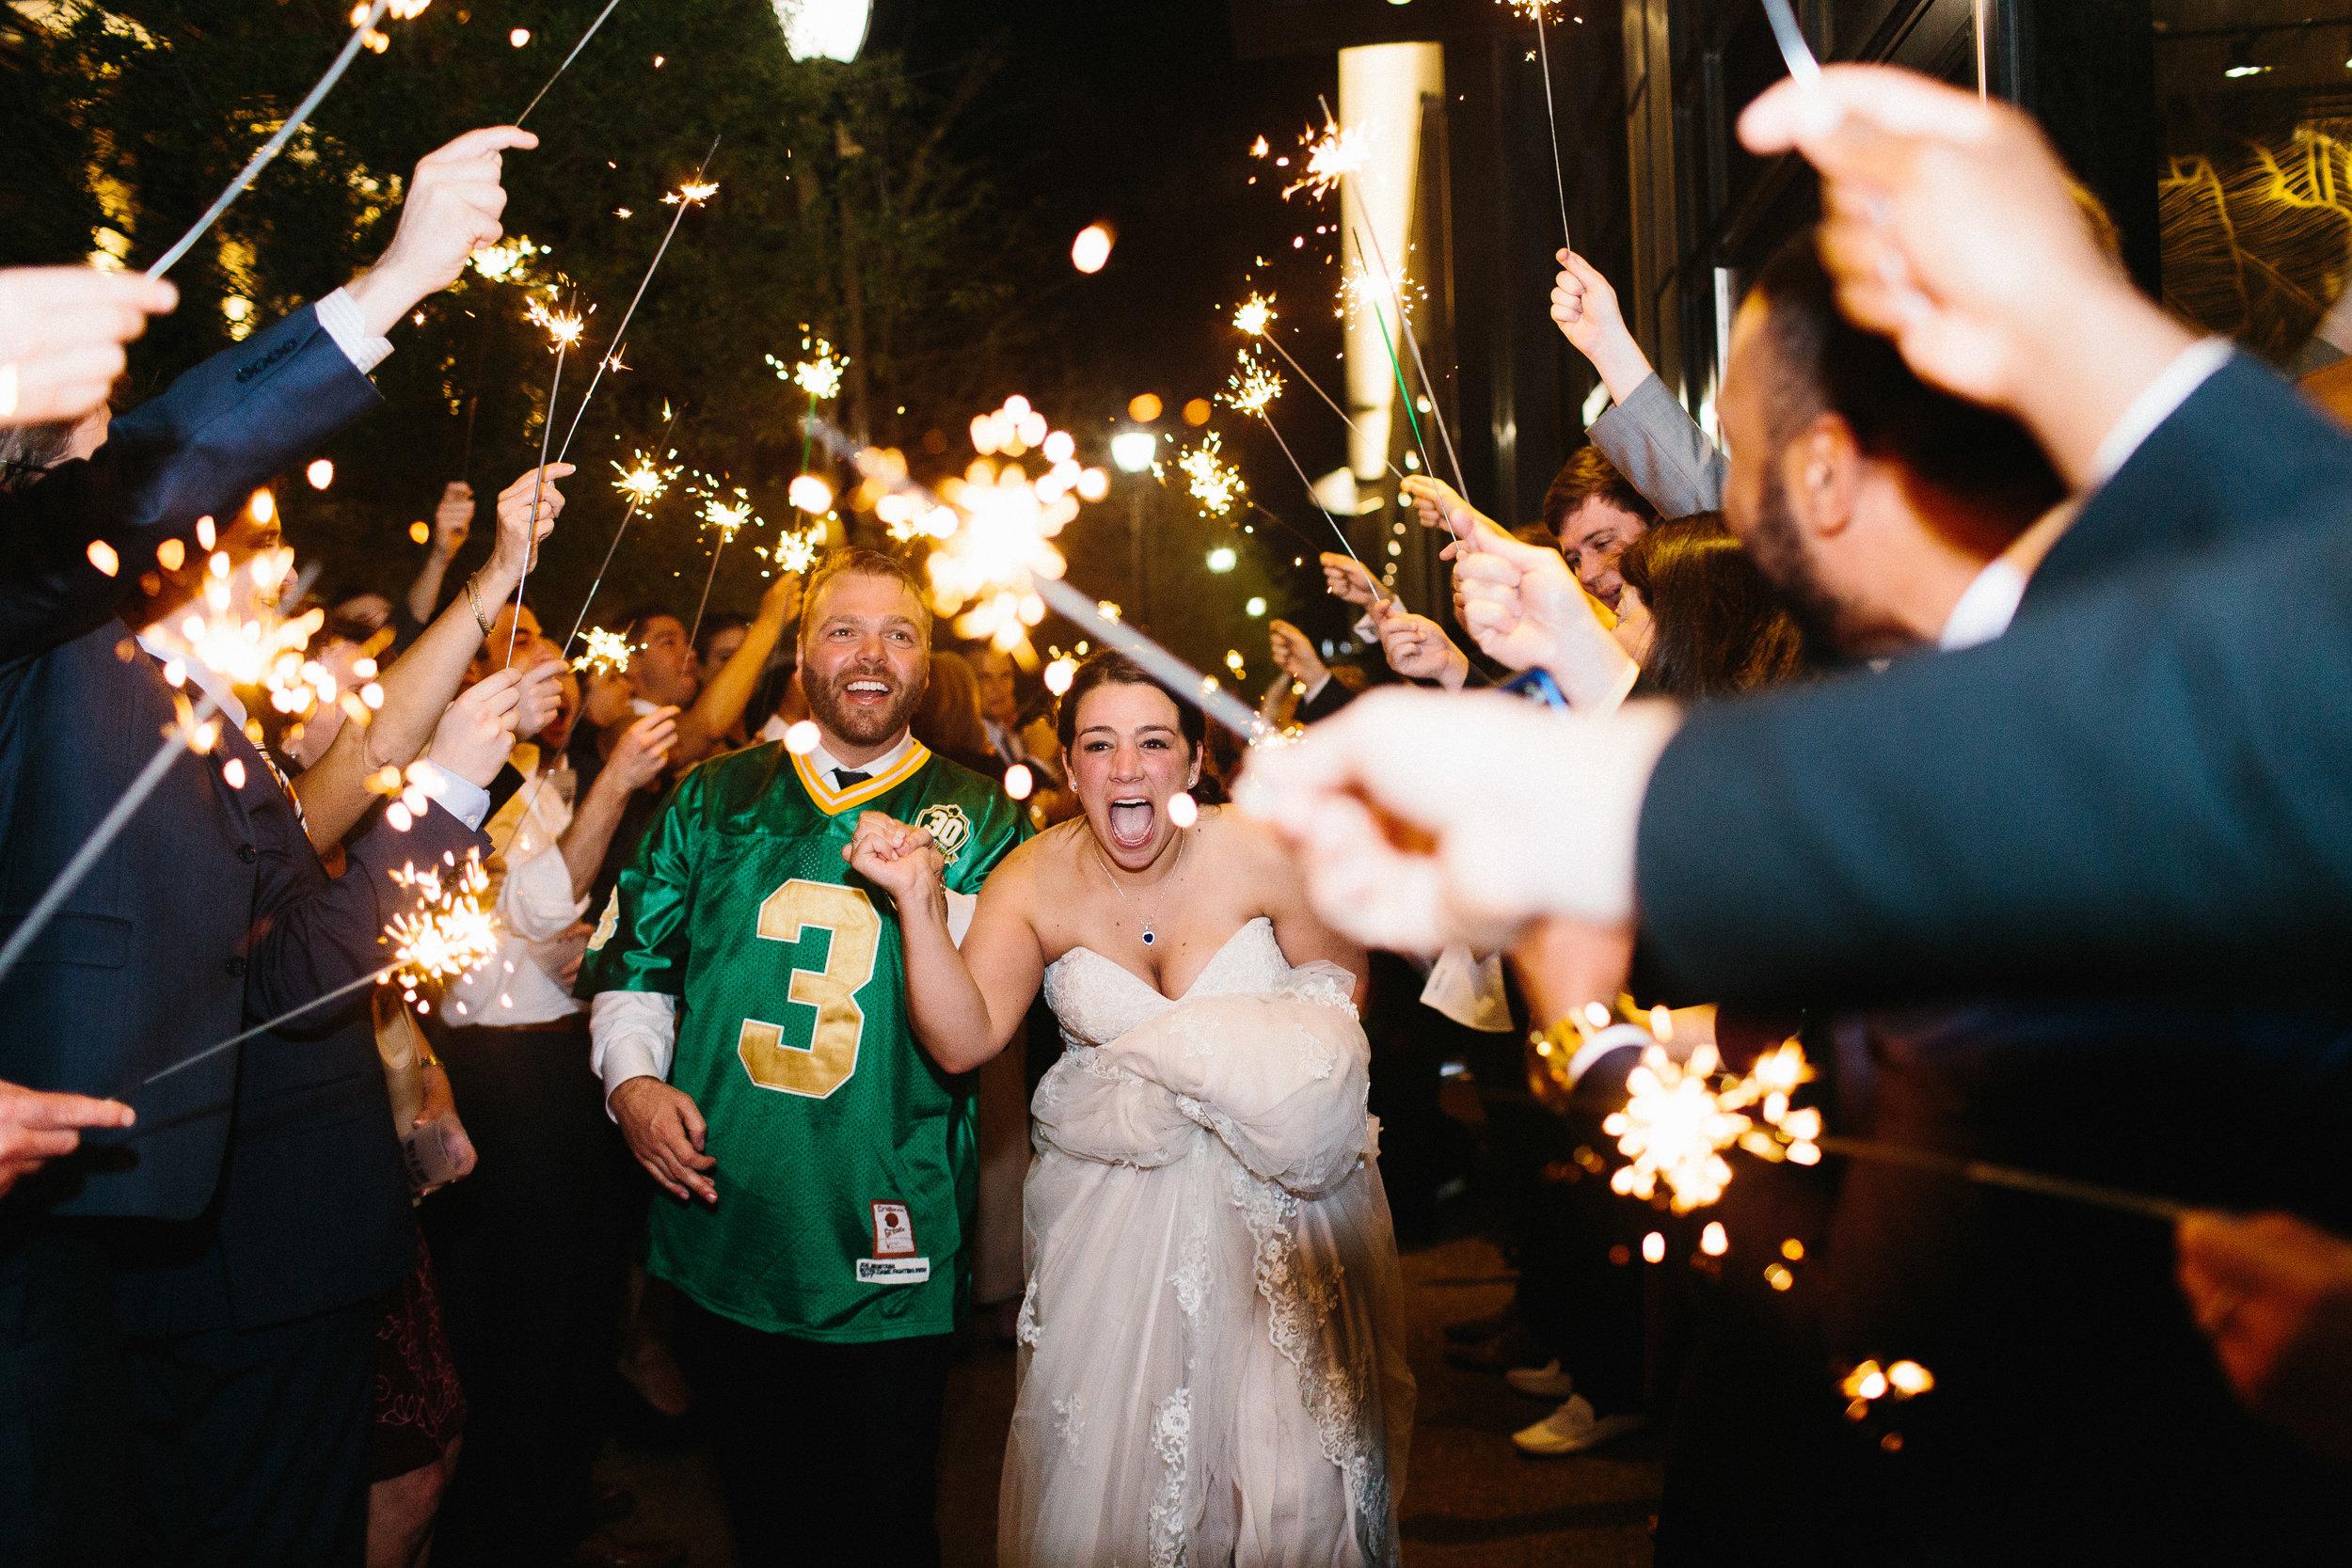 roswell_st_peter_chanel_catholic_avalon_hotel_alpharetta_wedding-2326.jpg